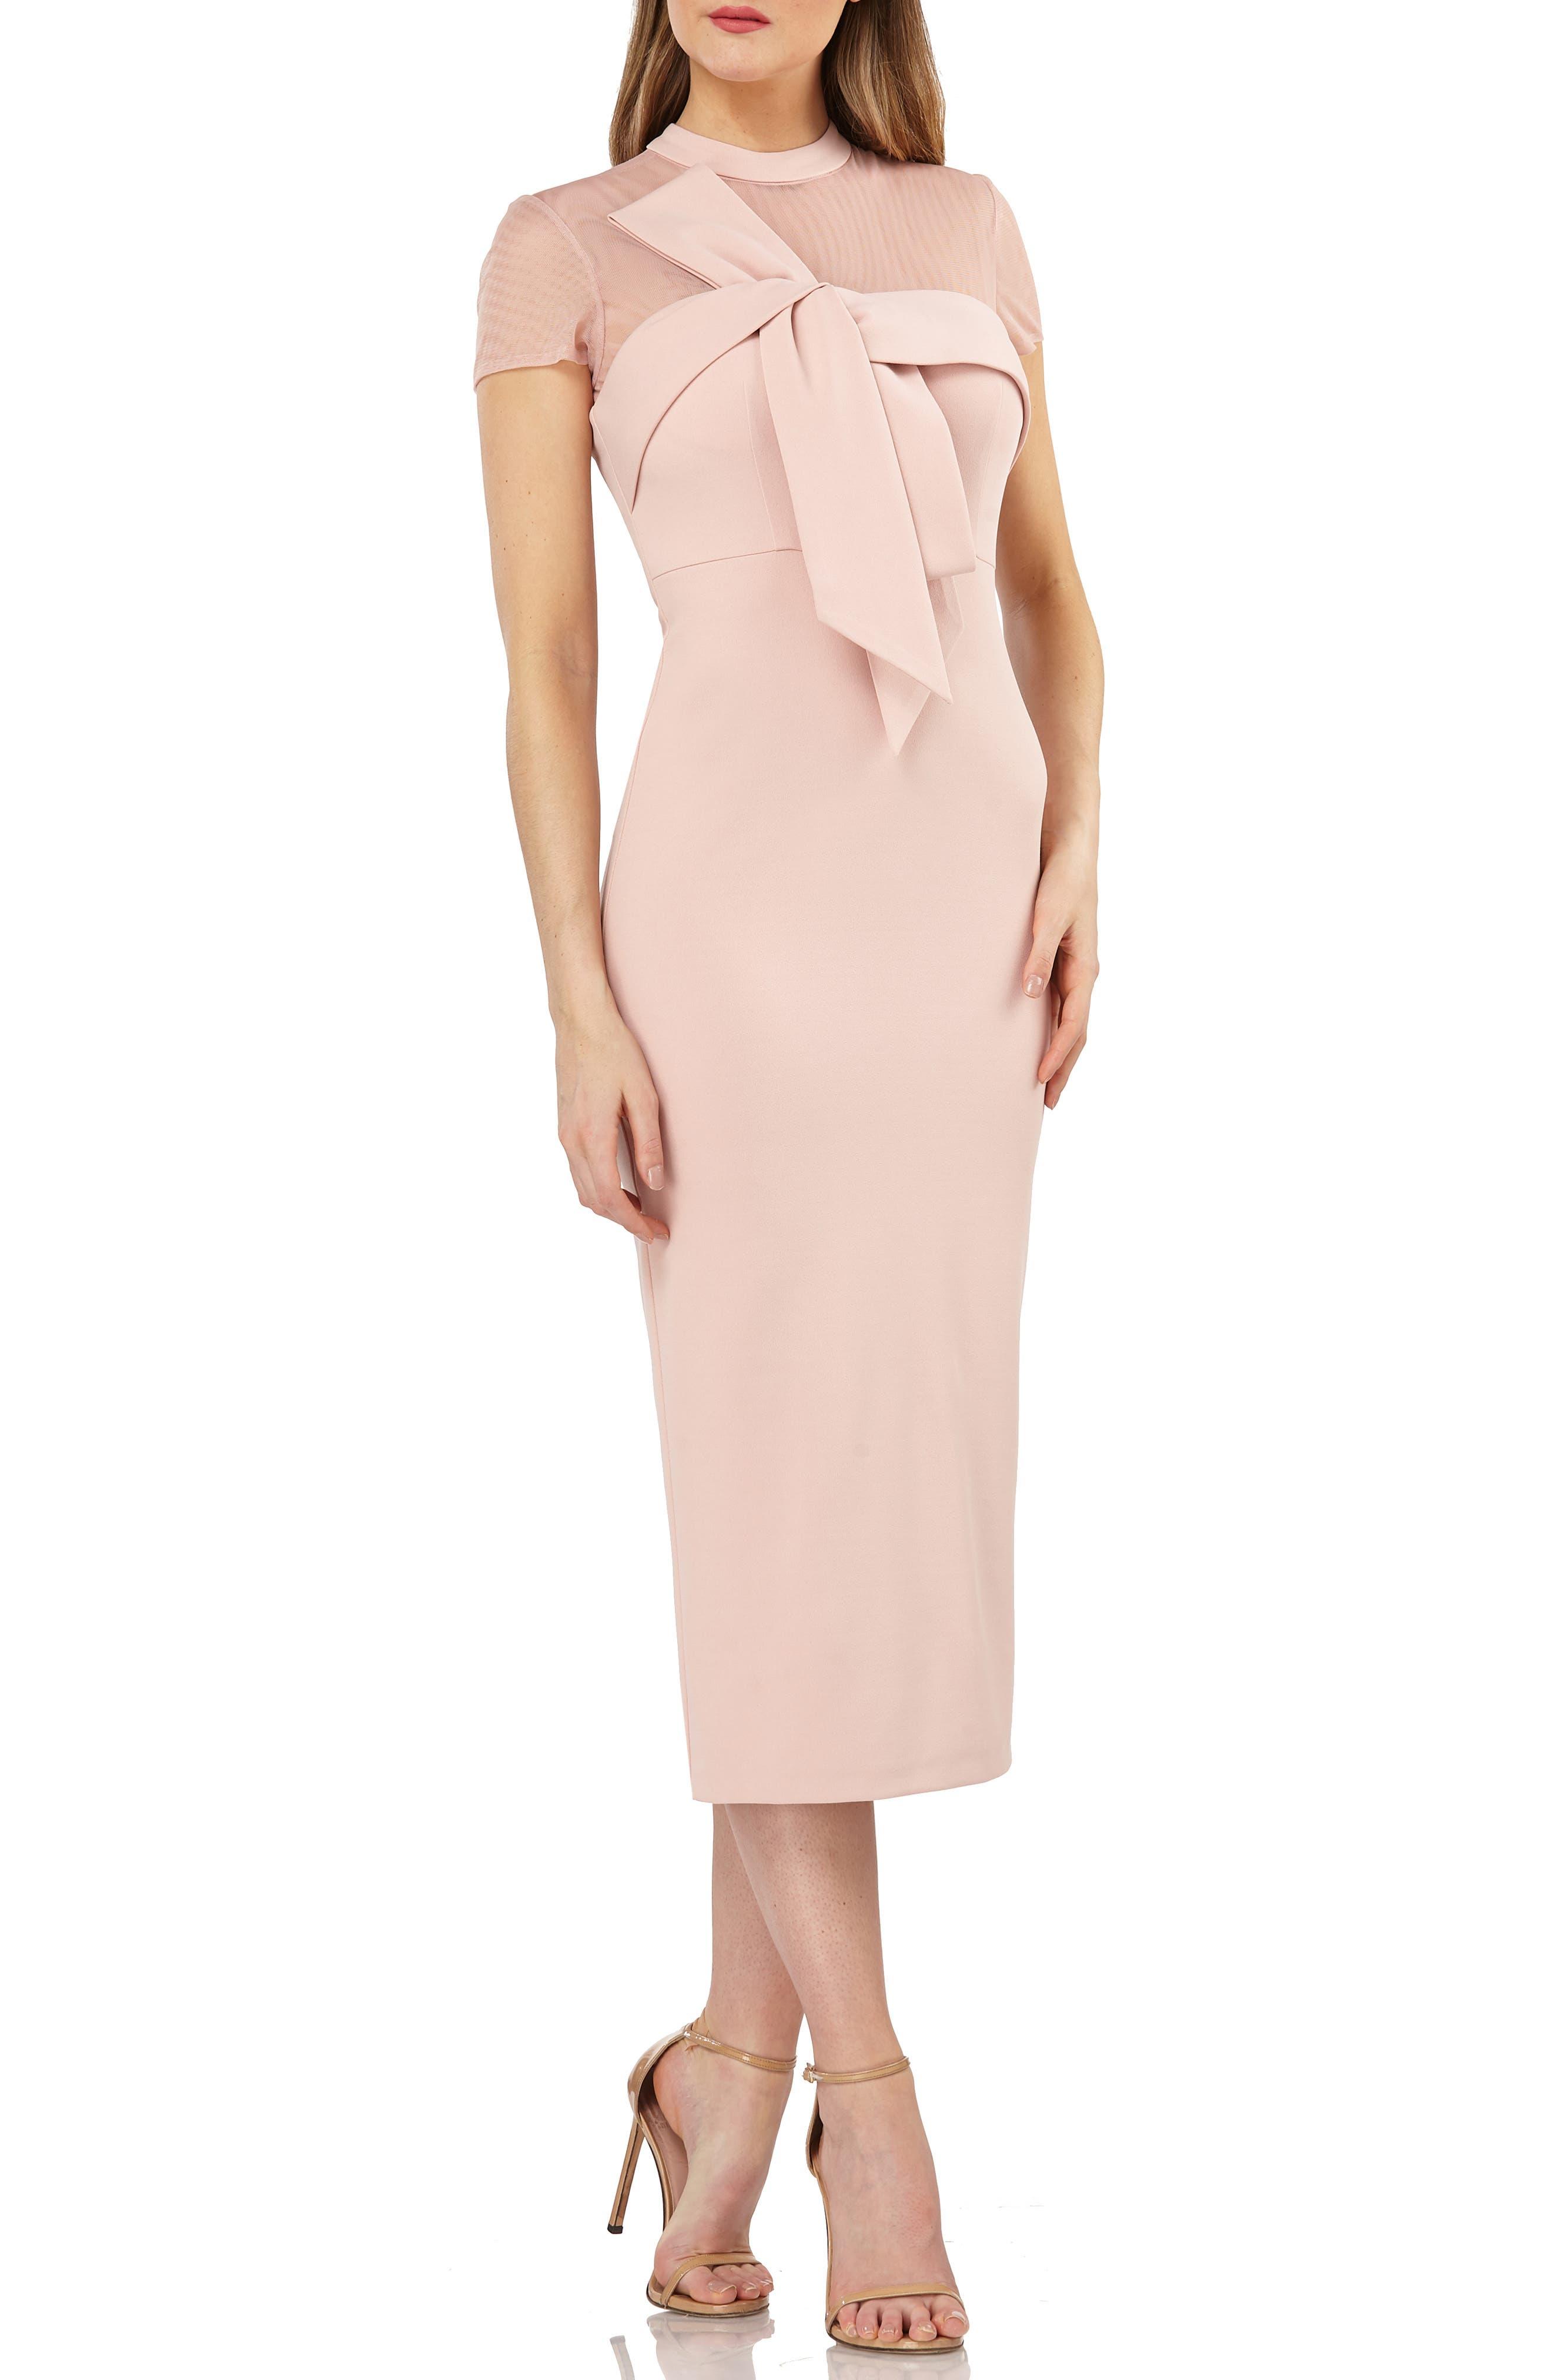 60s Dresses | 1960s Dresses Mod, Mini, Hippie Womens Js Collections Stretch Crepe Dress Size 12 - Pink $178.00 AT vintagedancer.com